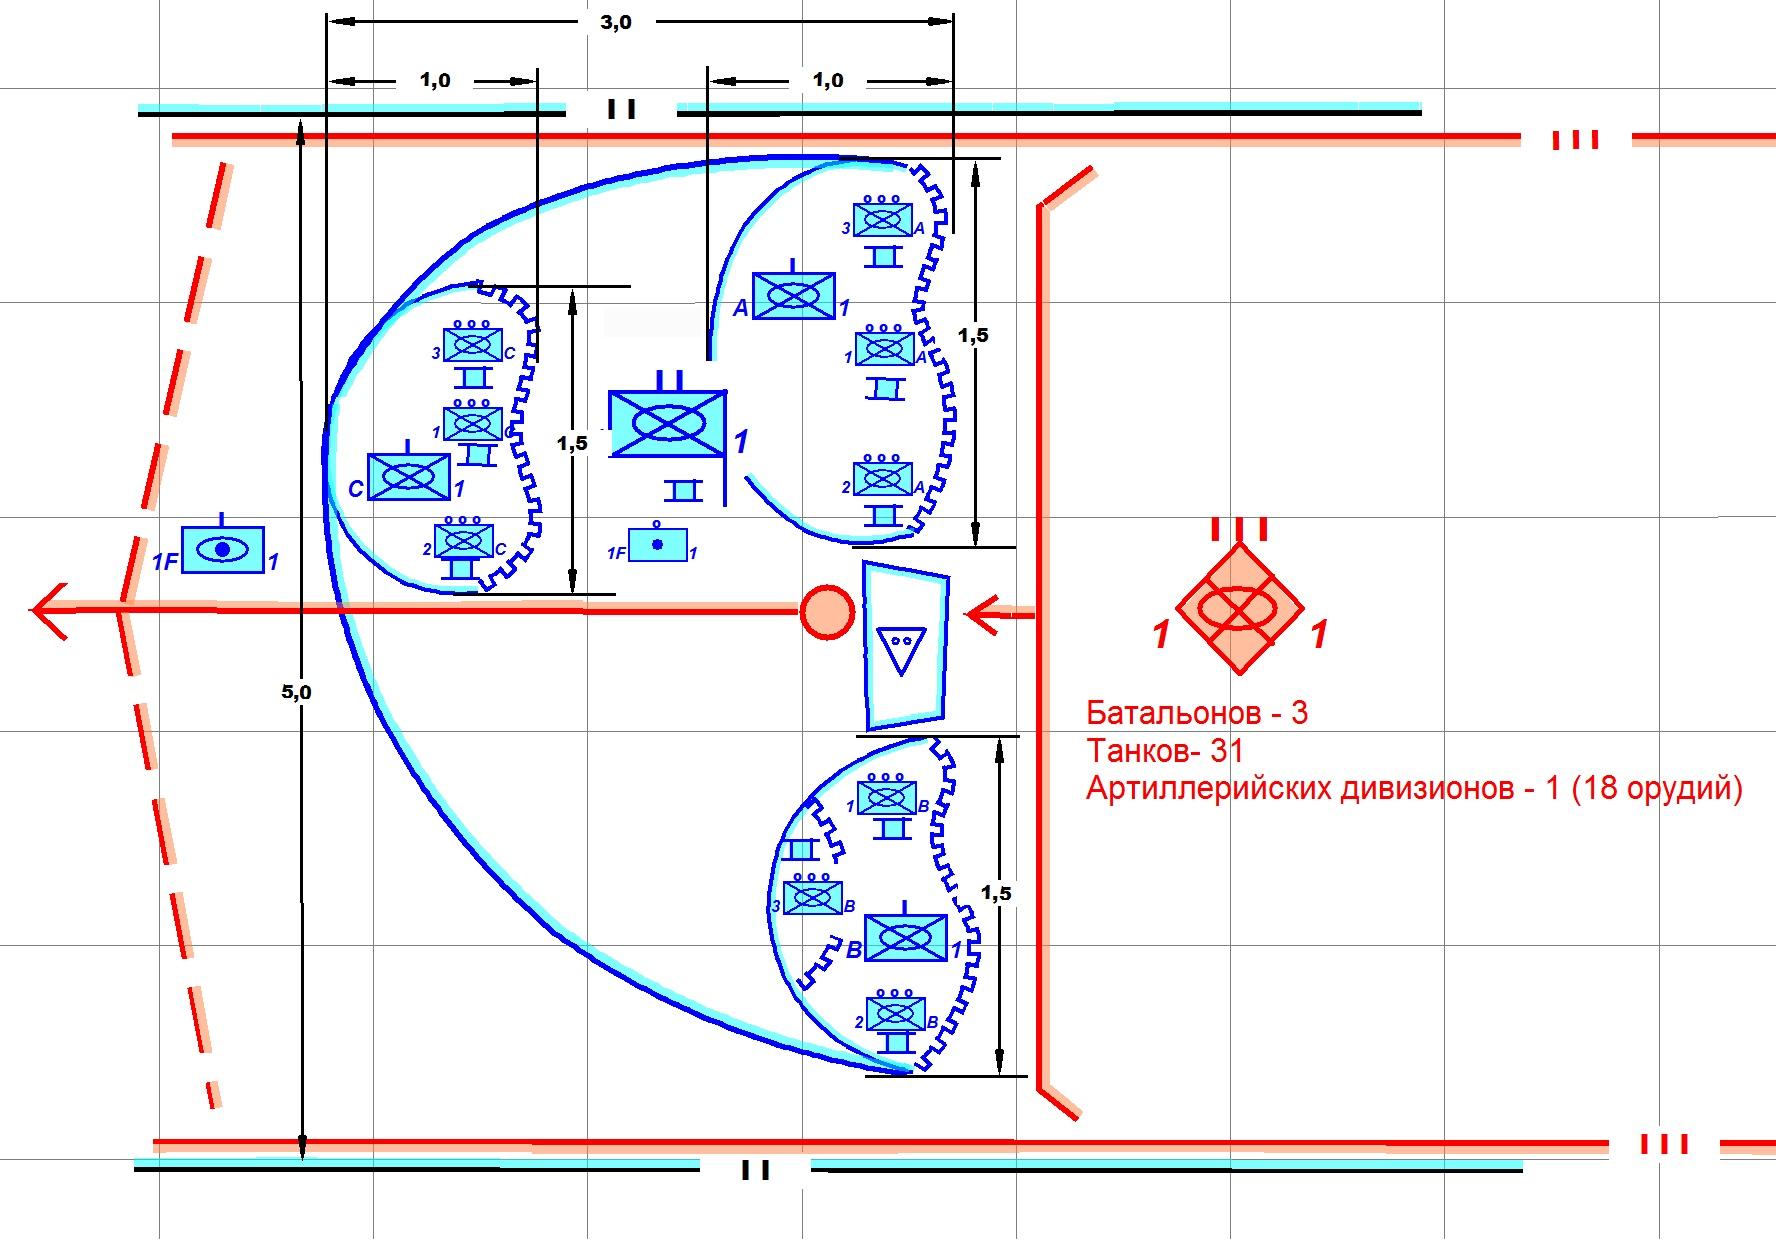 схема батальона